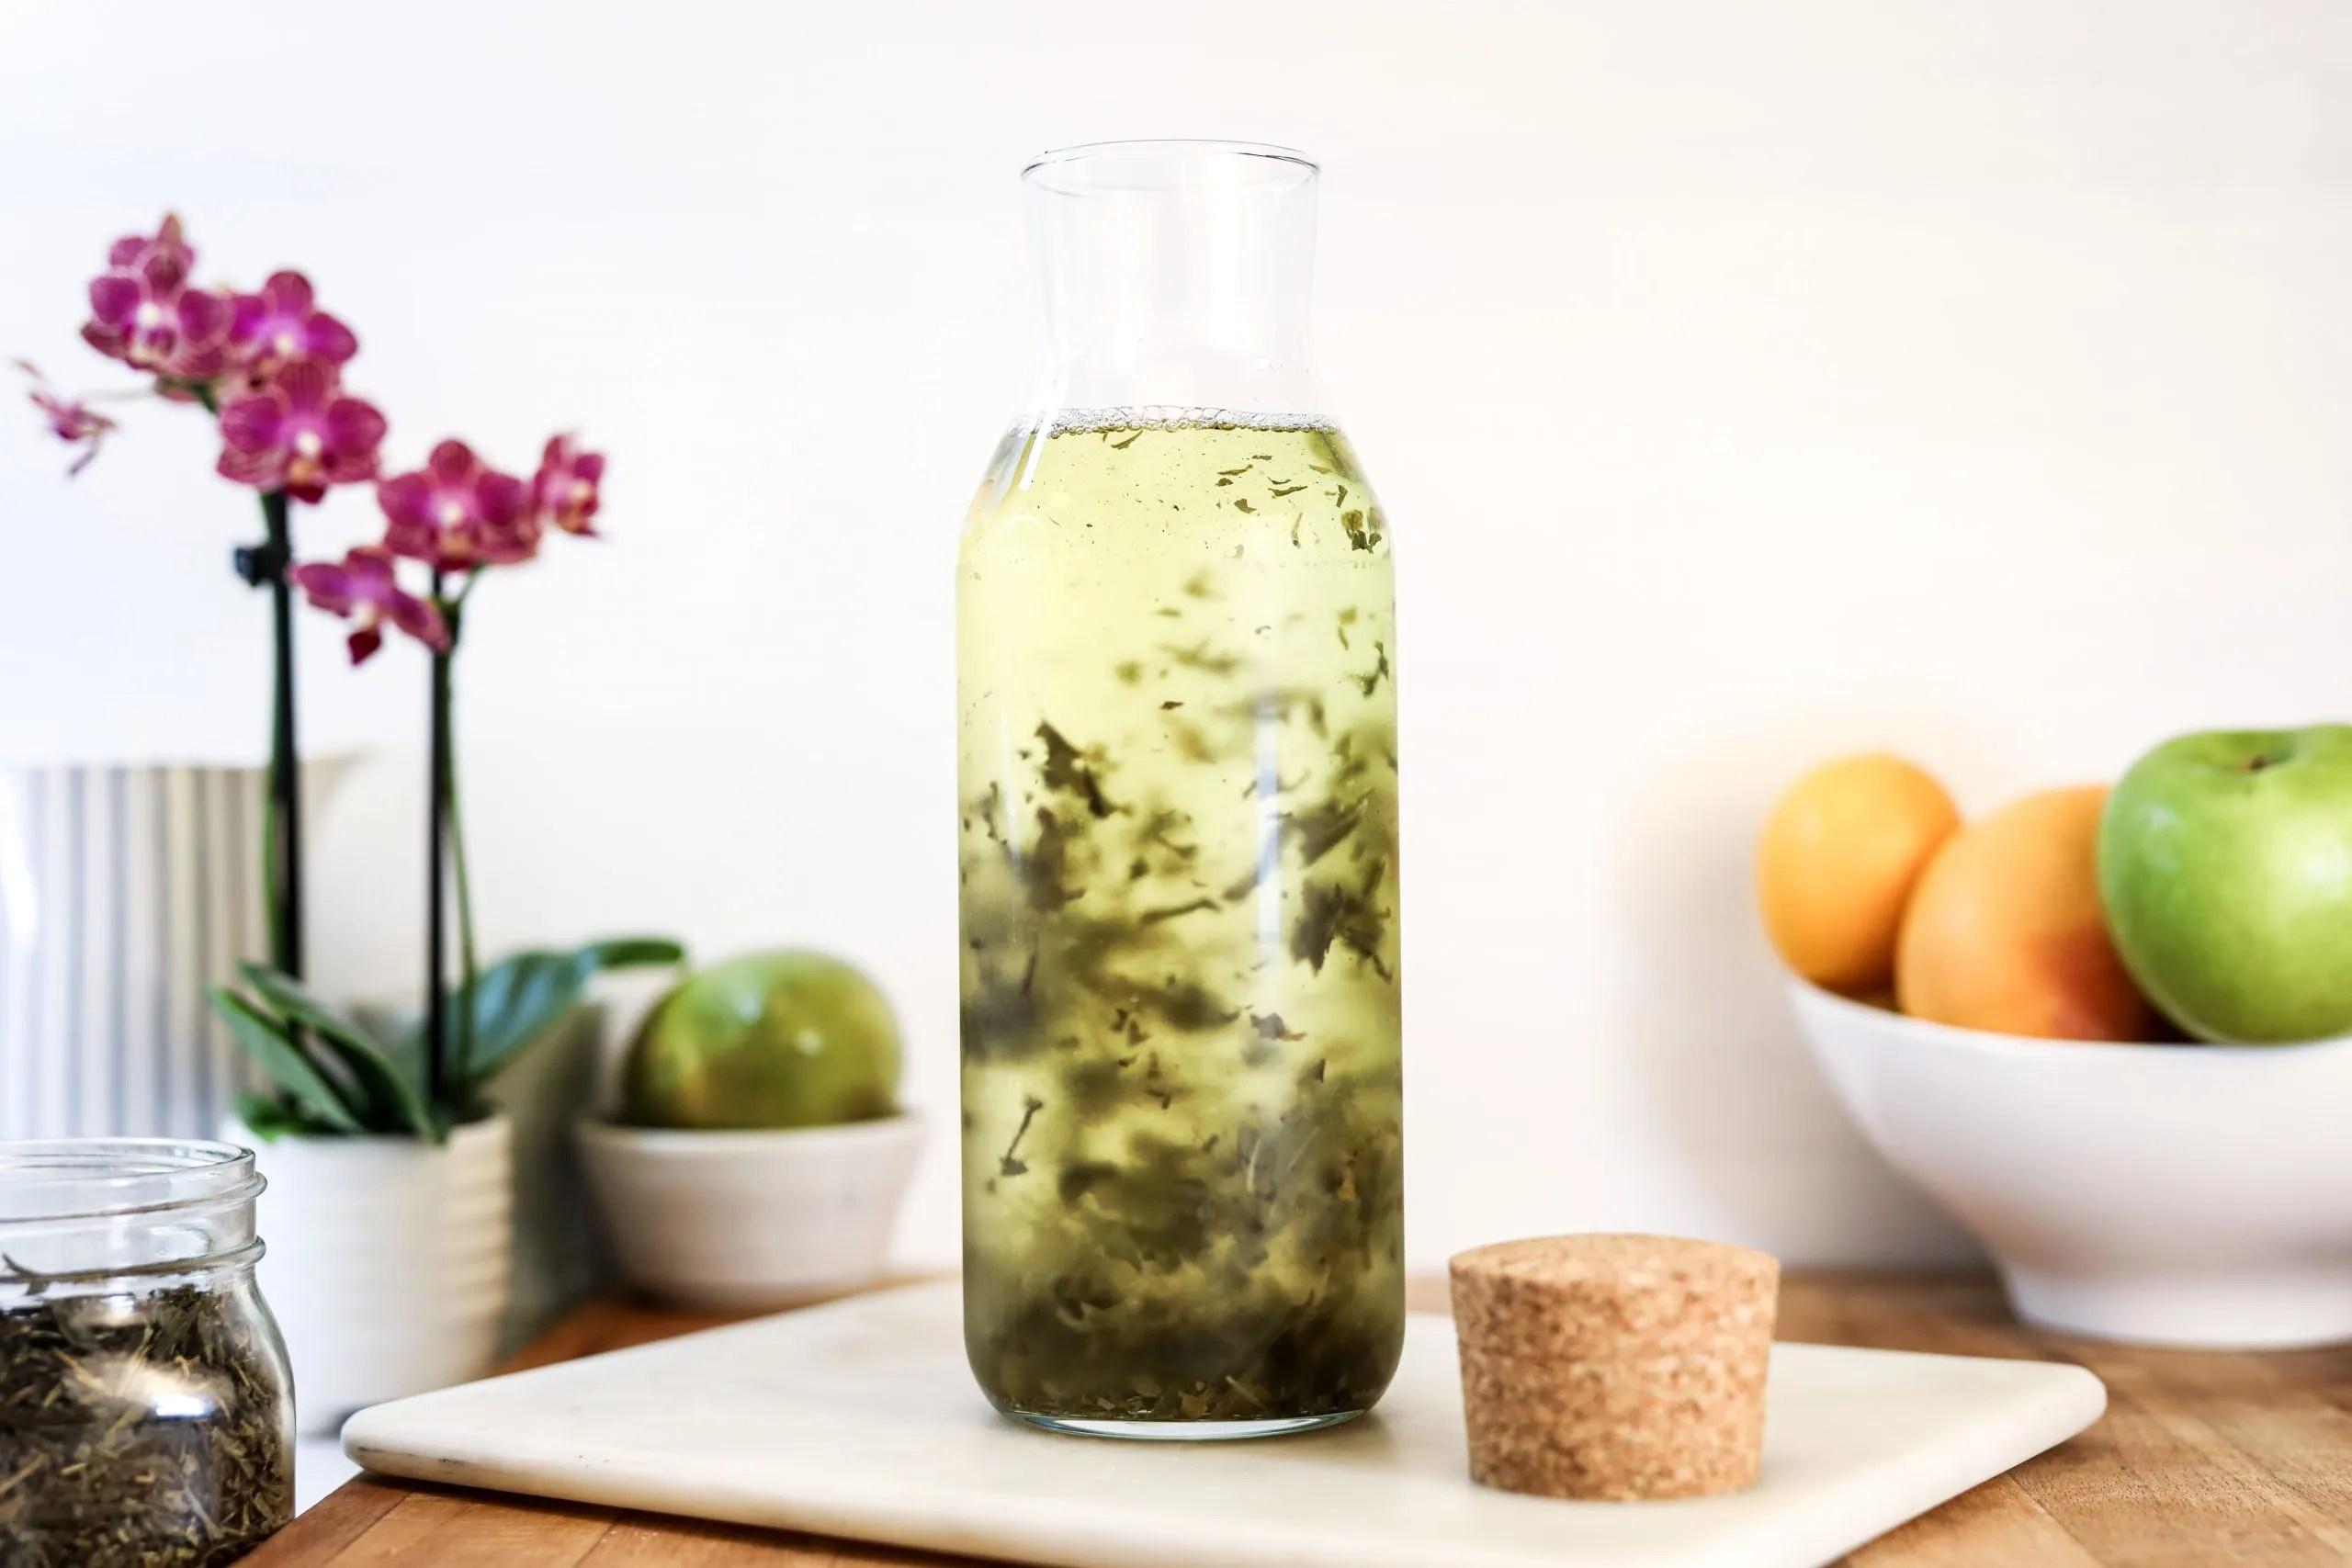 Tea leaves infusing